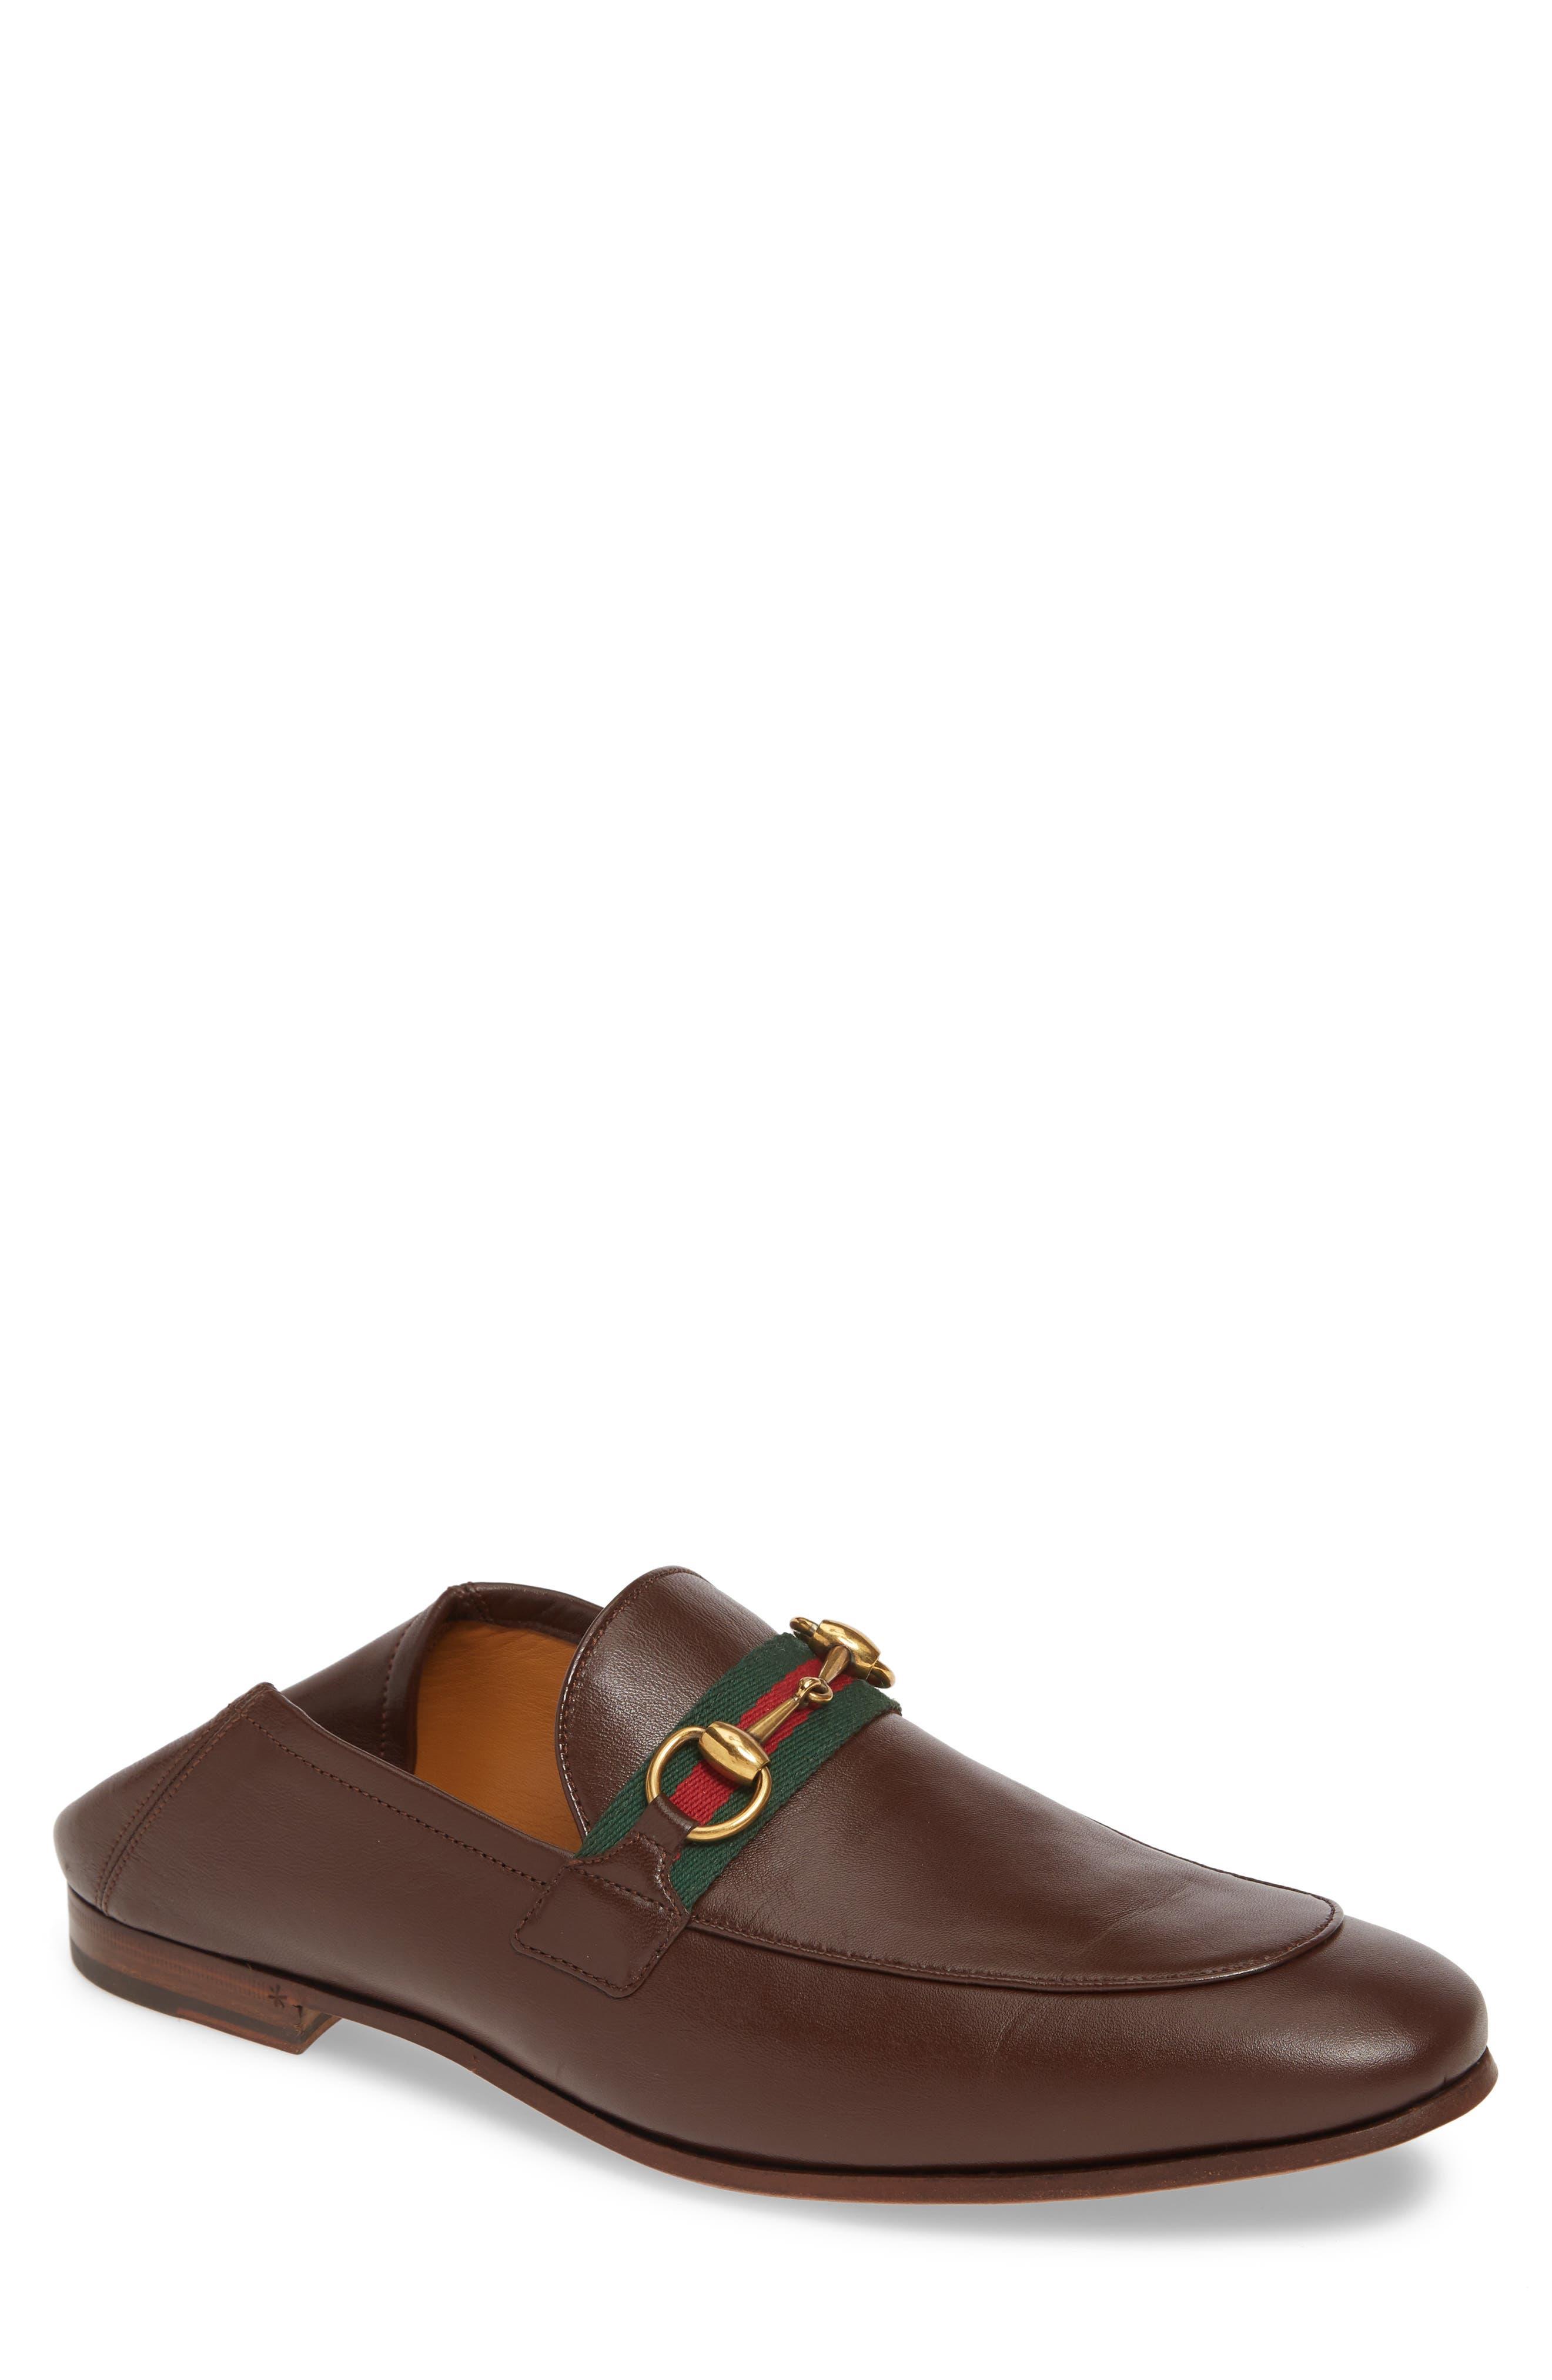 Men's Gucci Loafers \u0026 Slip-Ons   Nordstrom